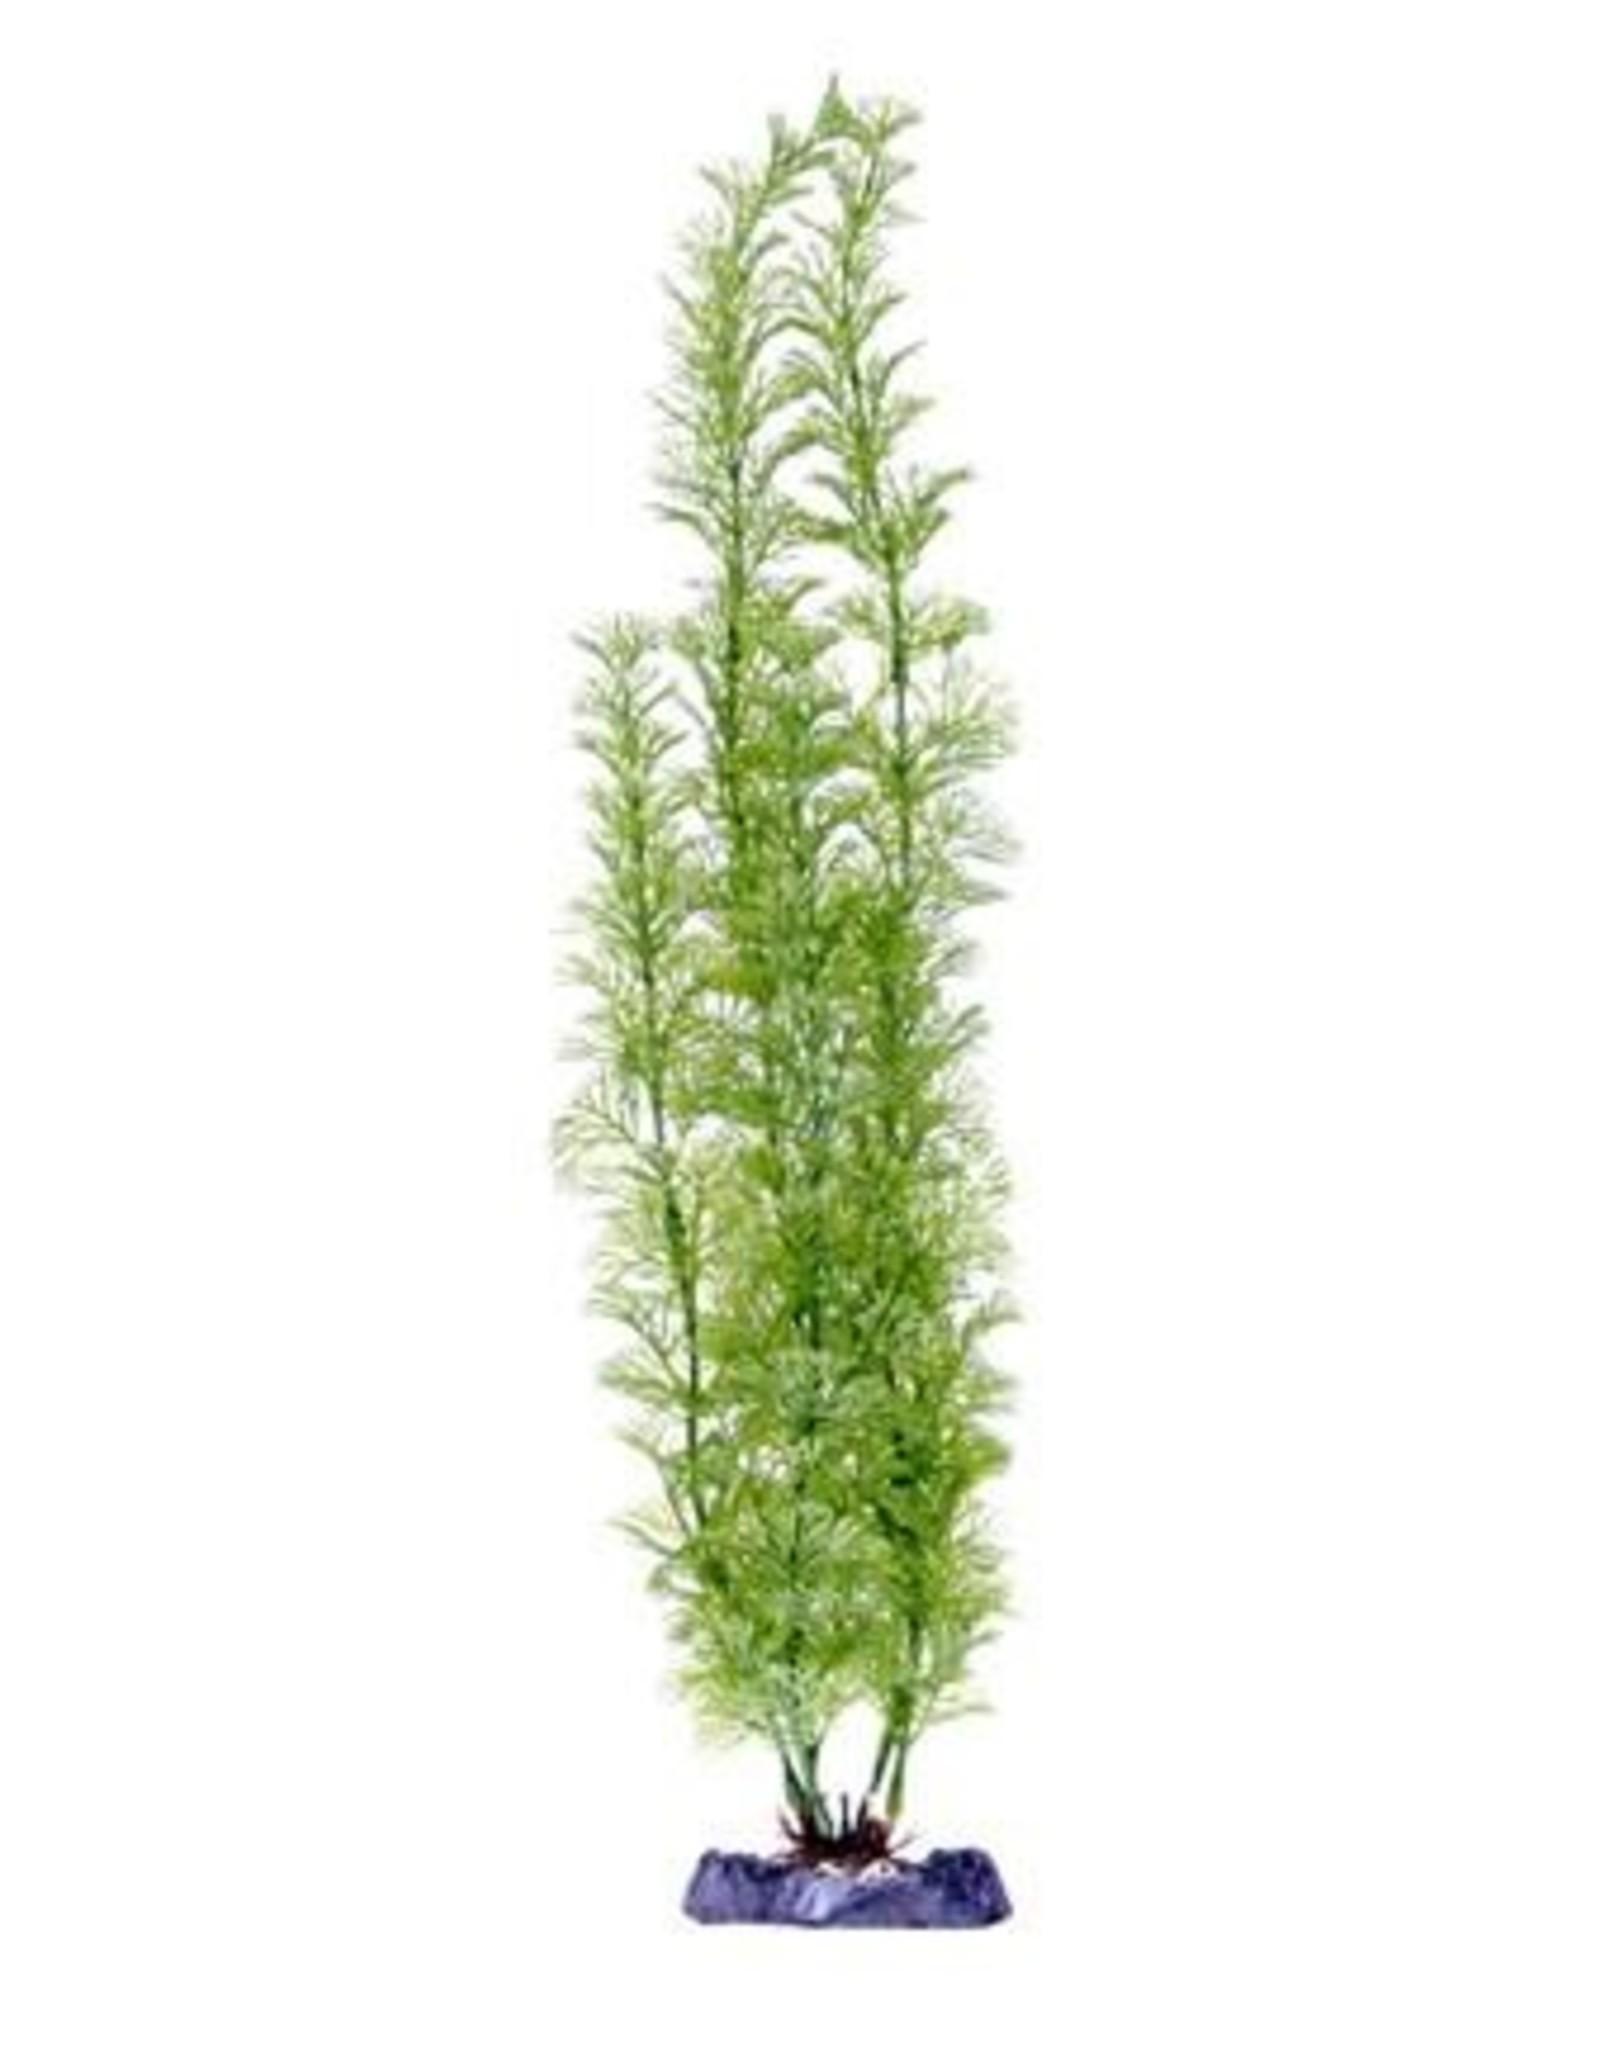 Penn Plax PENN PLAX Sinker Plant Flowering Cabomba Super